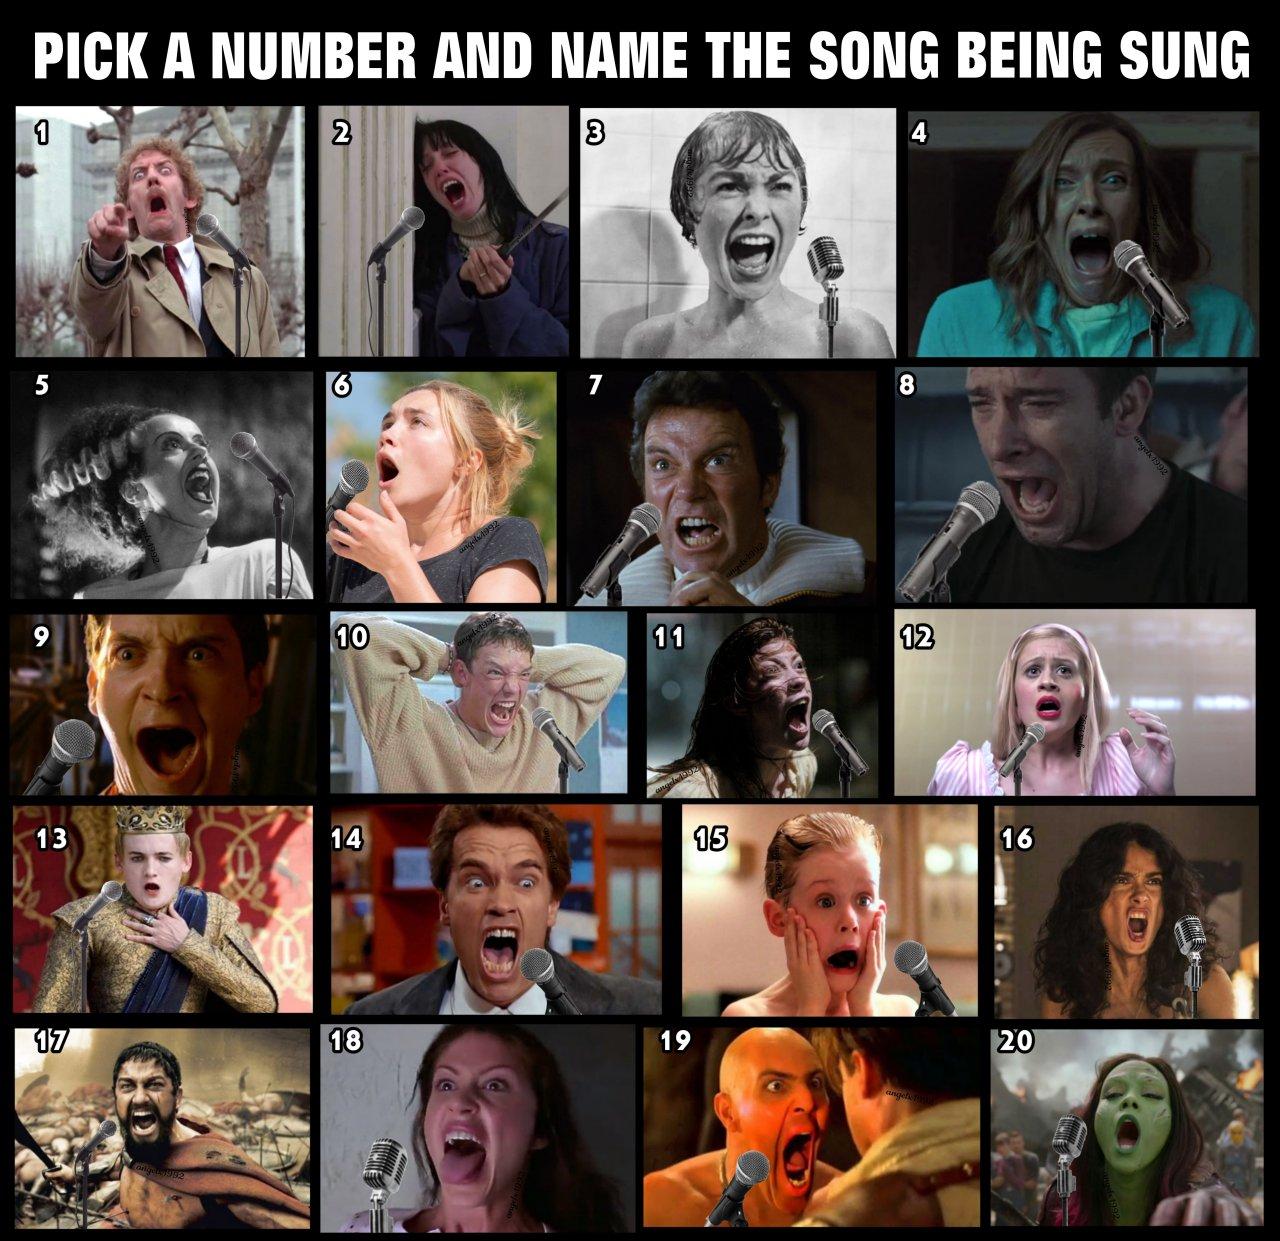 #memes#movies#scream#songs#singing#meme#horror movies#action movies#star trek#salma hayek#300 #game of thrones #the shining